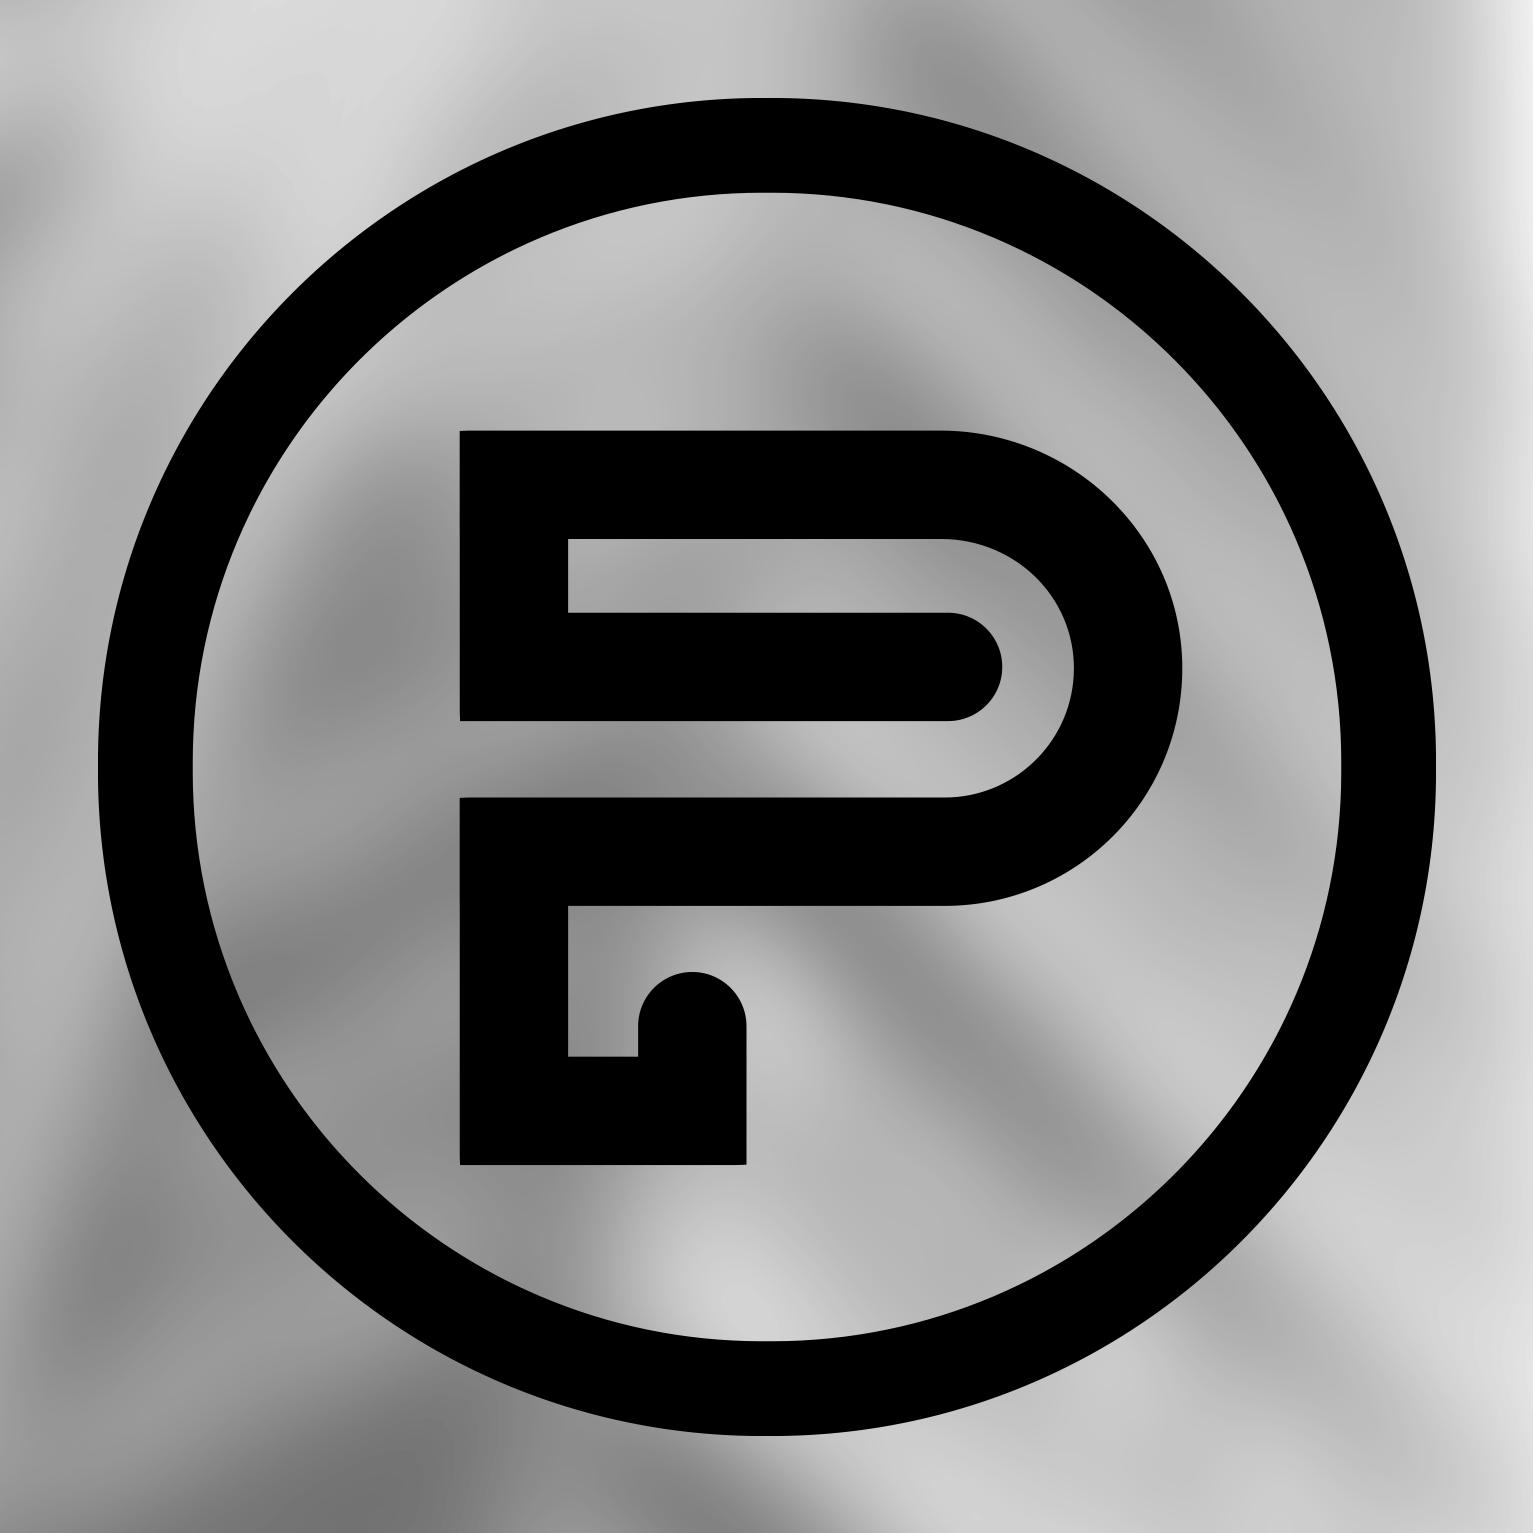 Pintree_opaque1.png